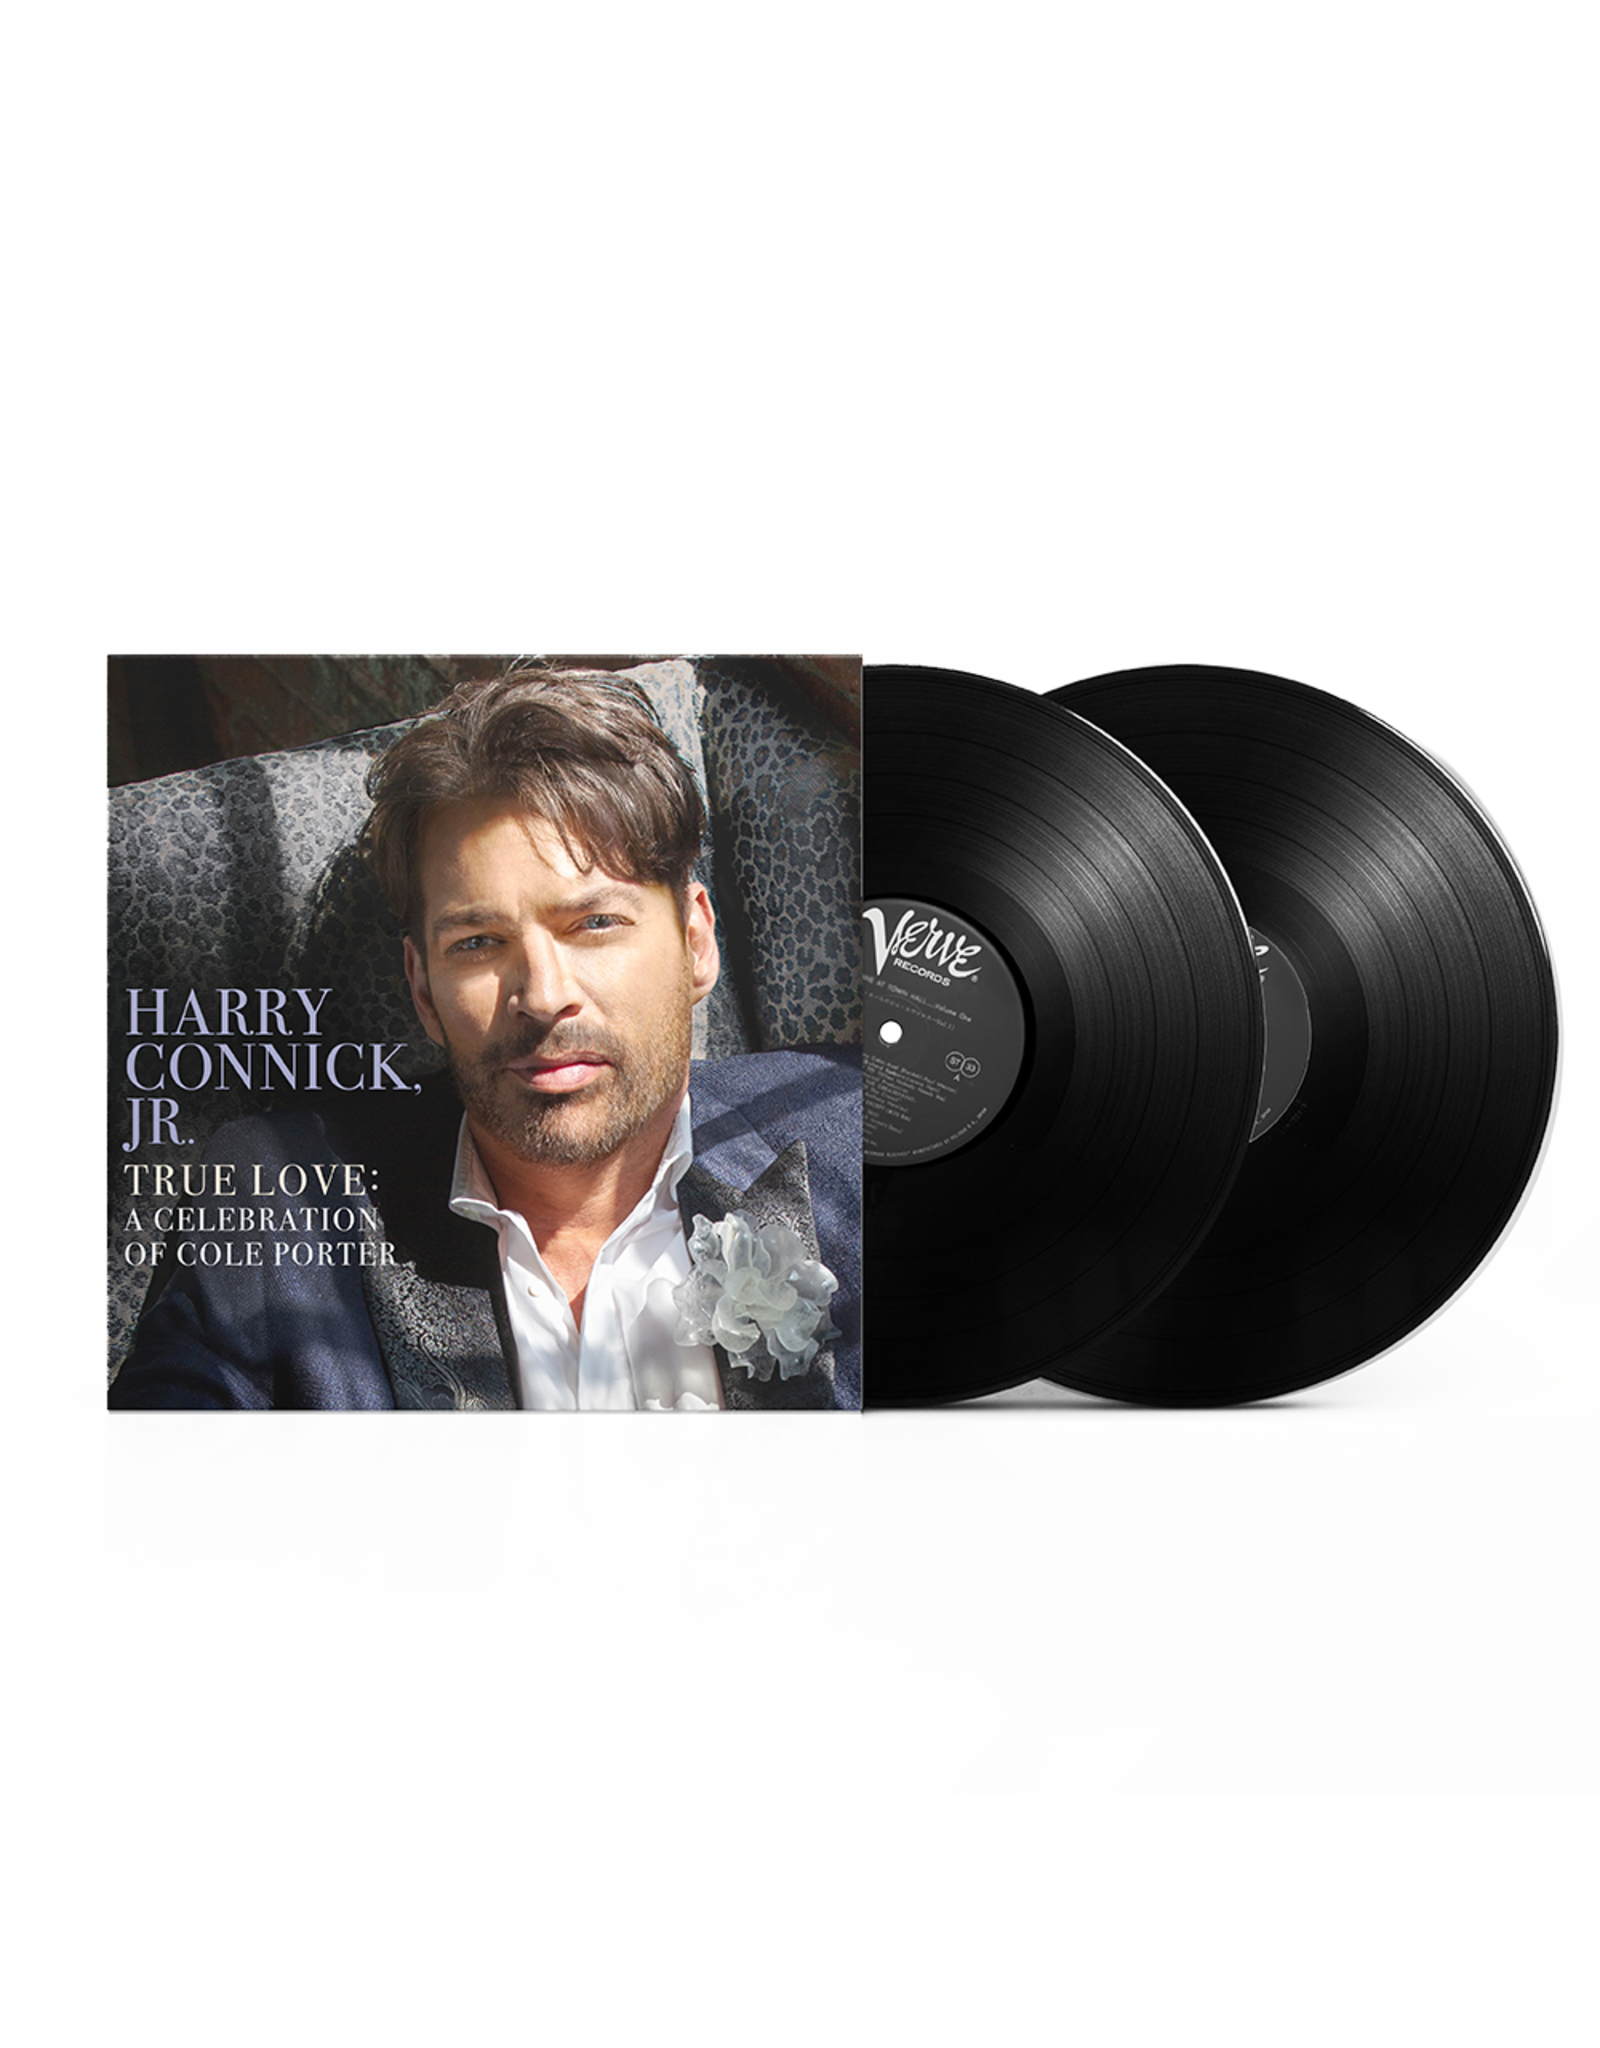 Harry Connick Jr. - True Love: A Celebration of Cole Porter